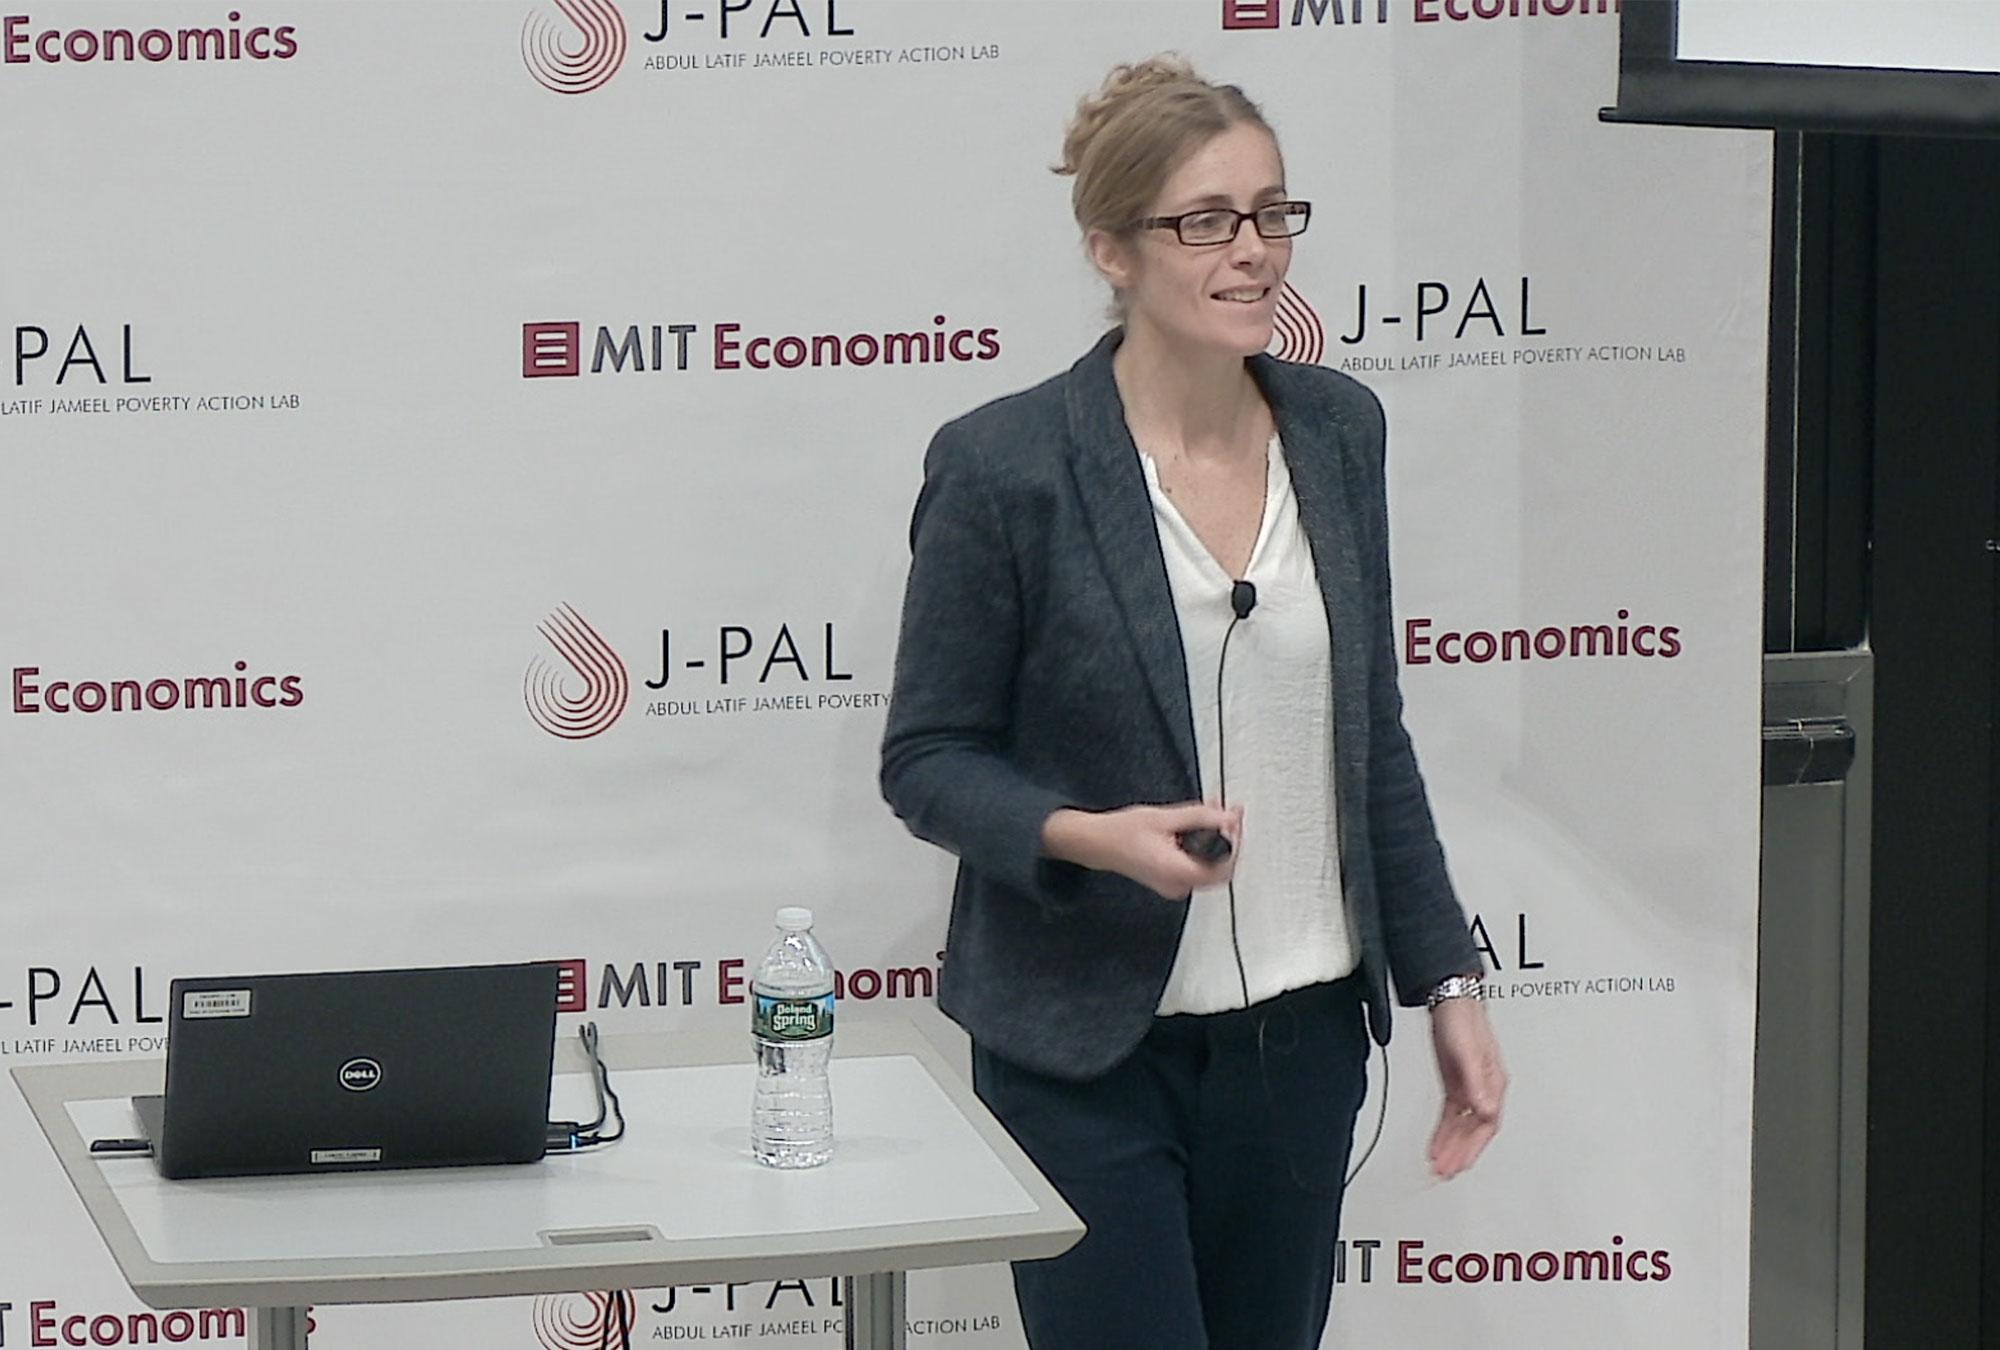 Pascaline Dupas presents at a podium